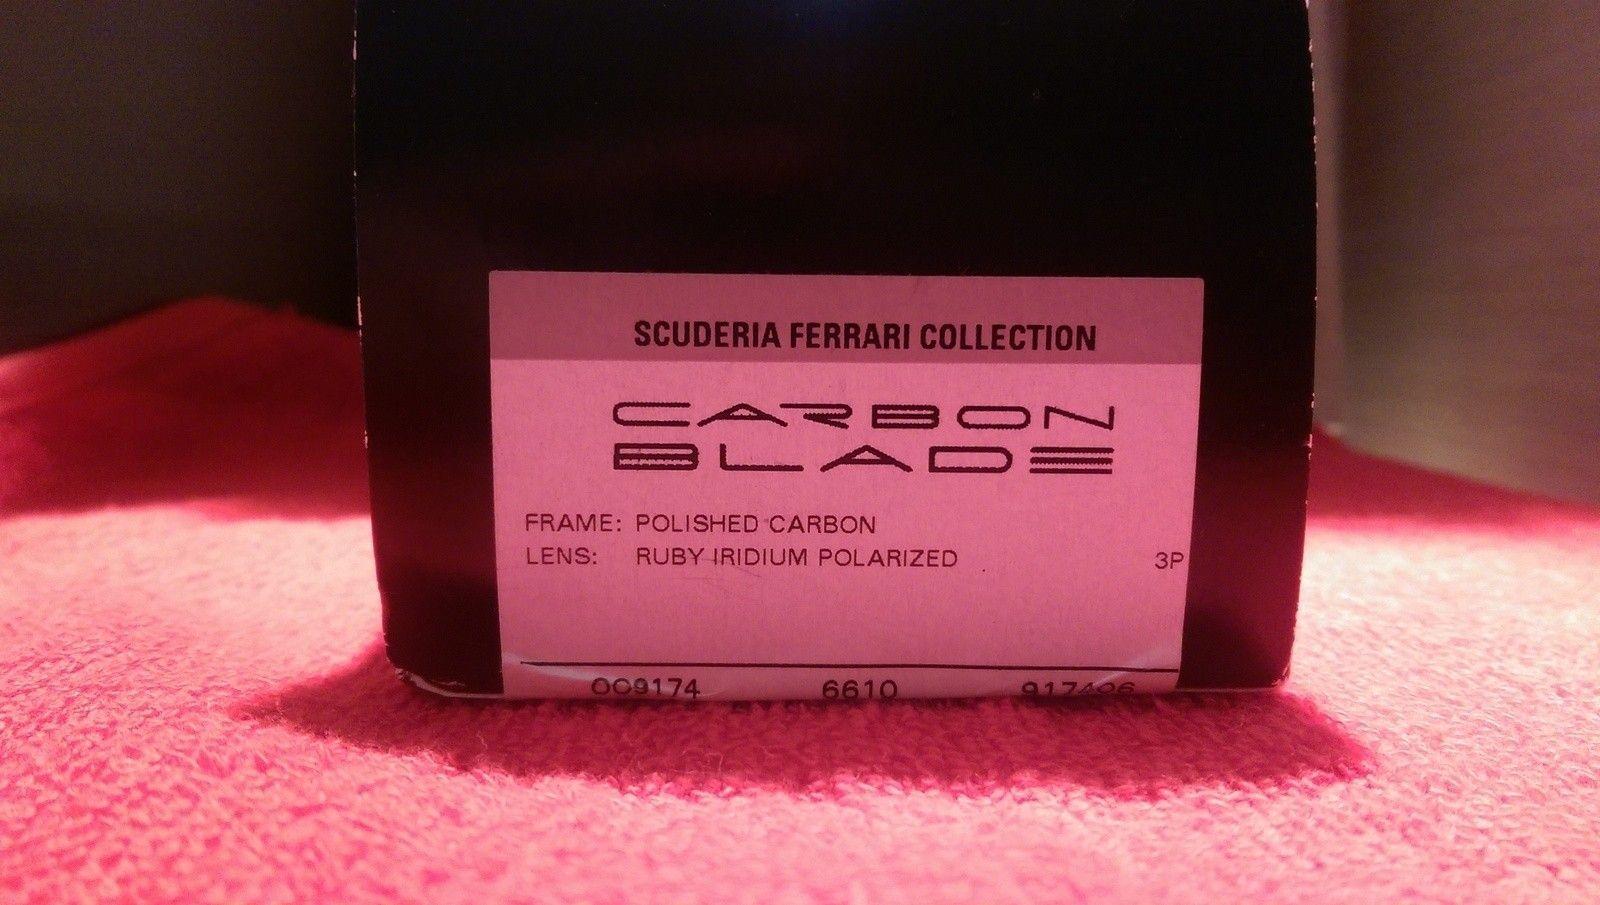 Oakley Scuderia Ferrari Carbon Blade ***Price Drop*** - uploadfromtaptalk1452607948239.jpg